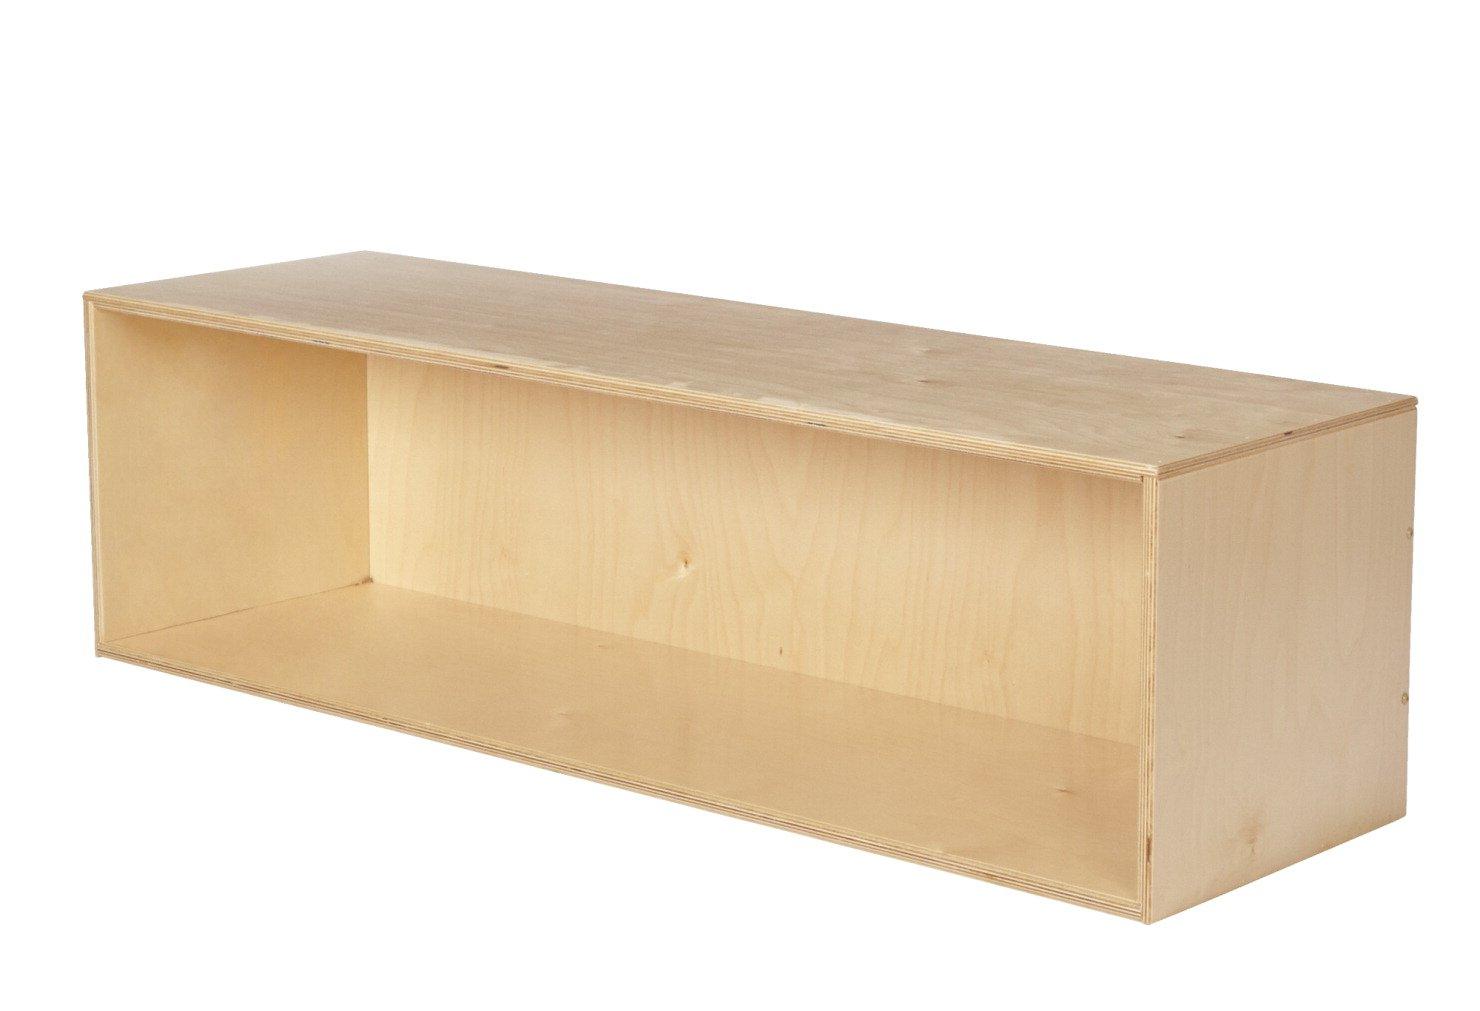 Childcraft Open Shelf Stacker Compartment Storage, 47-3/4 x 14-1/4 x 13-3/4 Inches